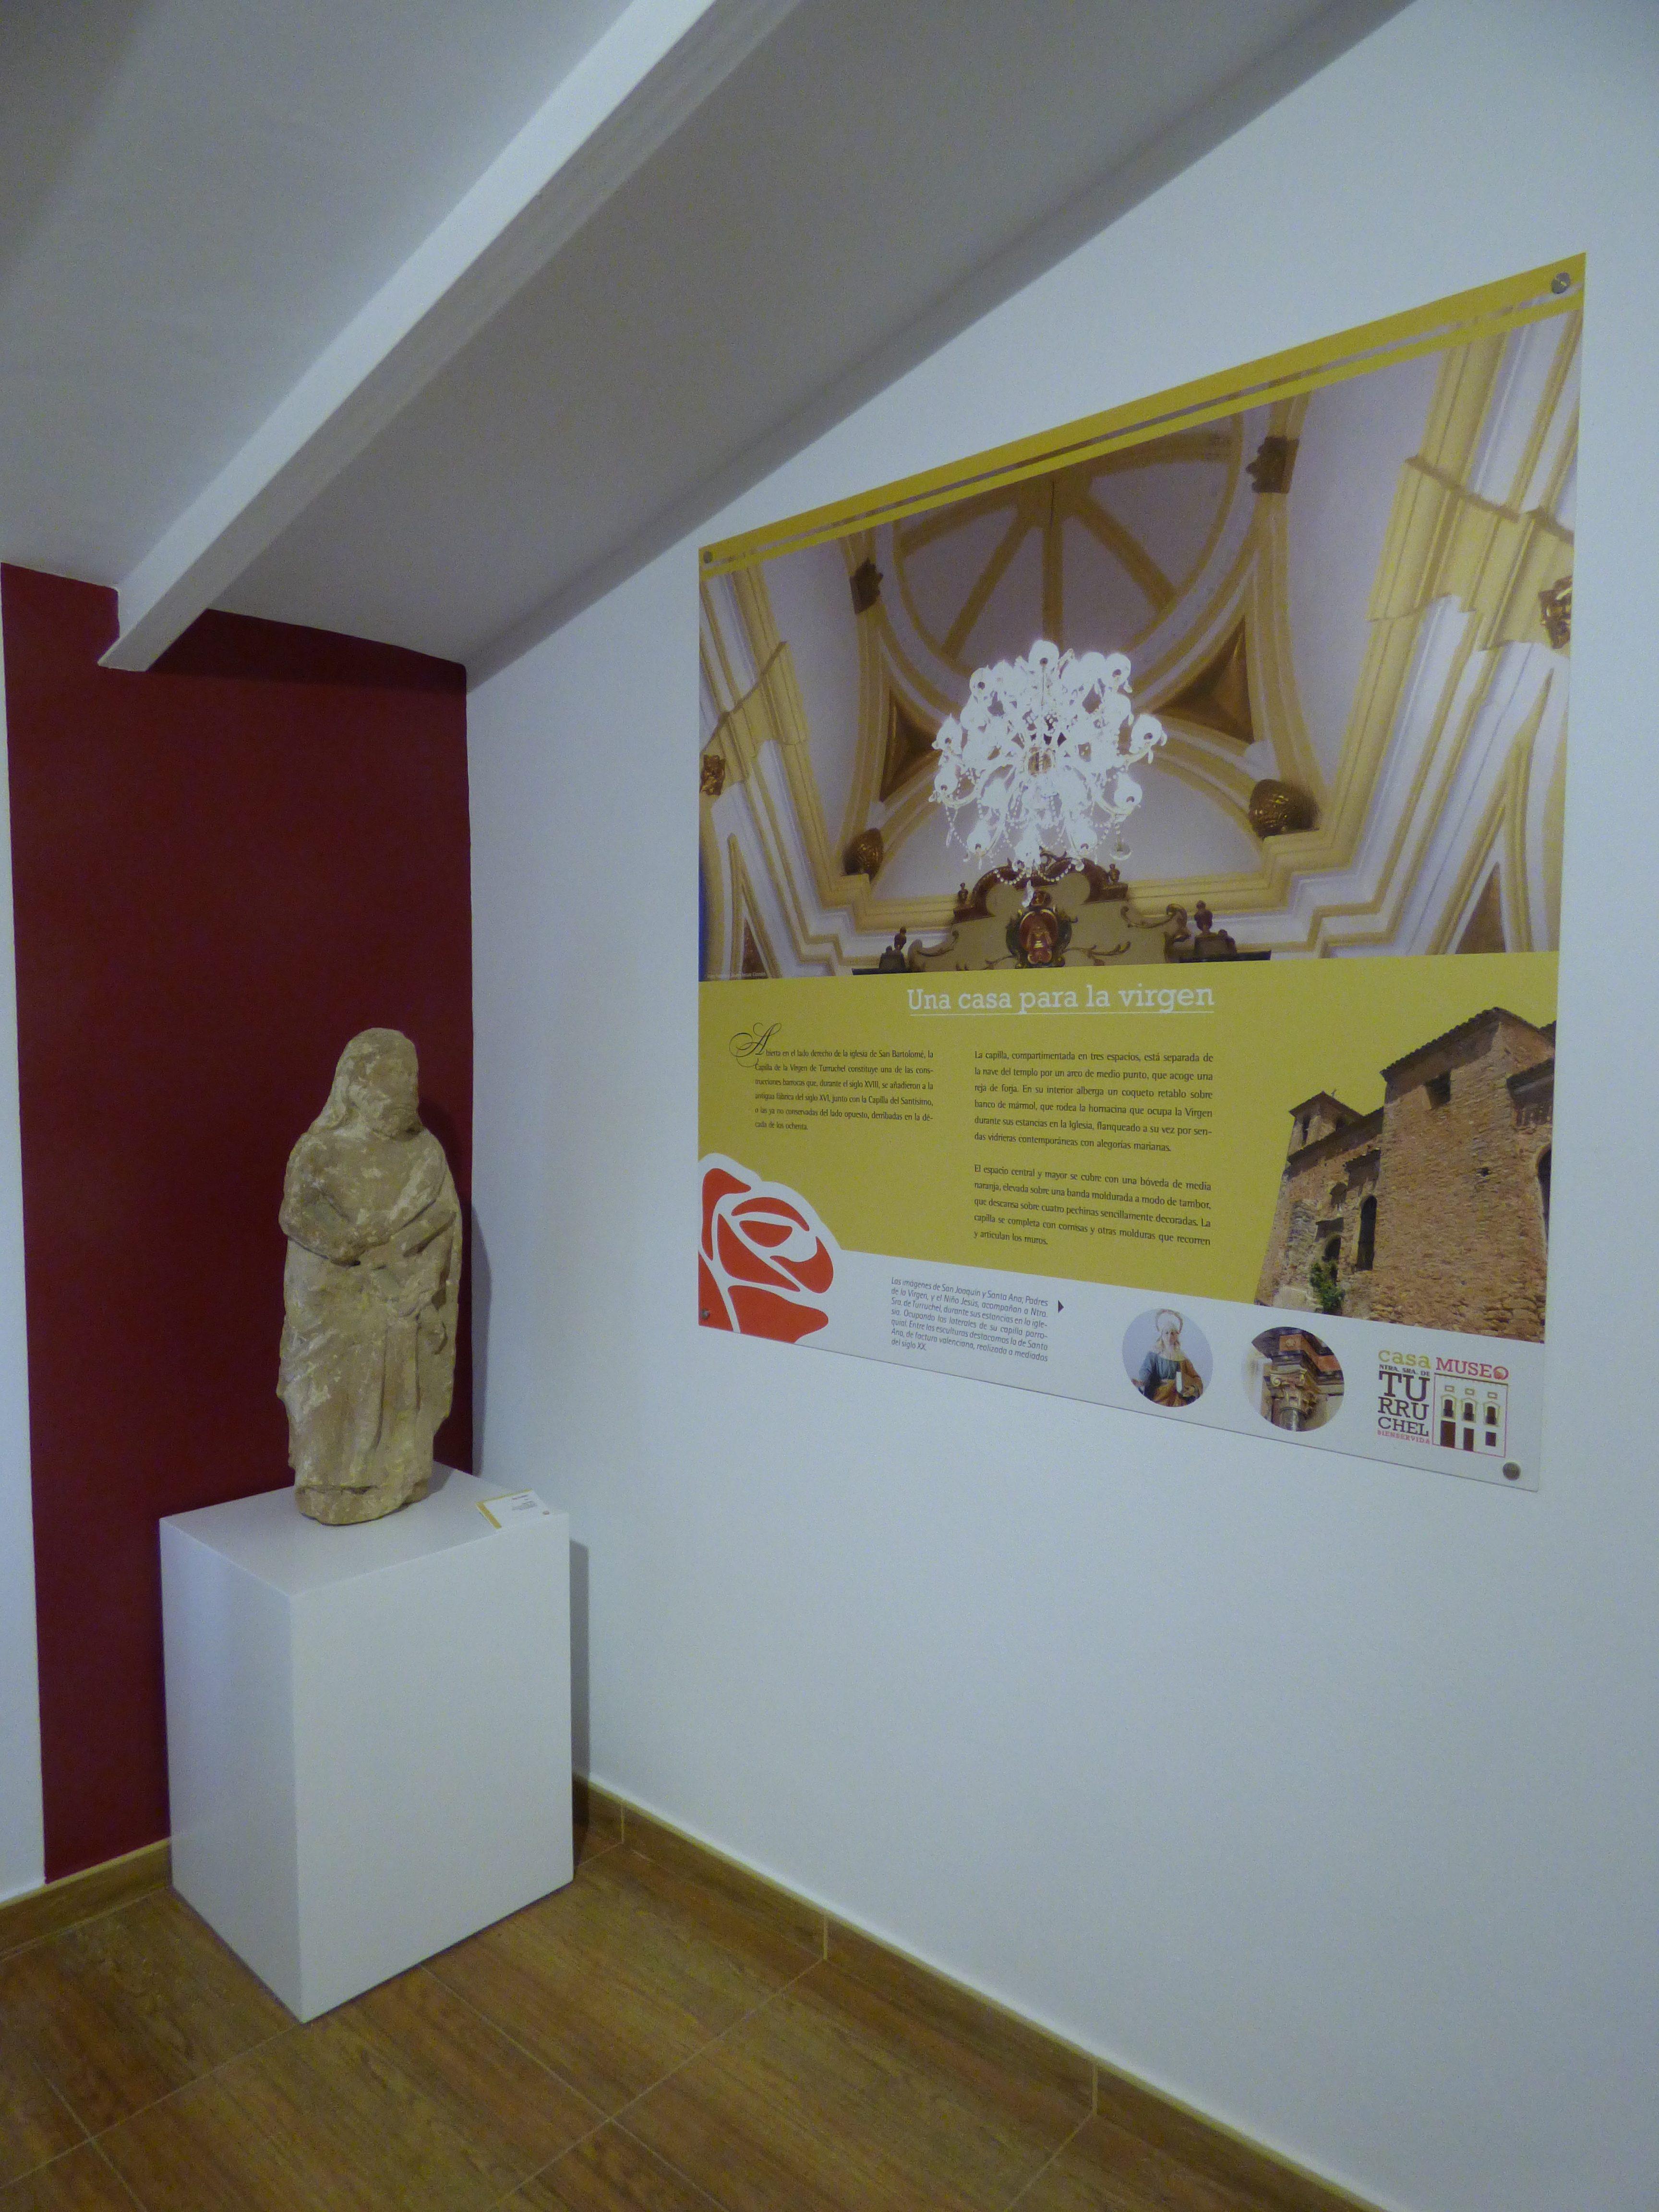 Museo Ntra. Sra. de Turruchel. Bienservida (Albacete)El Parteluz. S.L